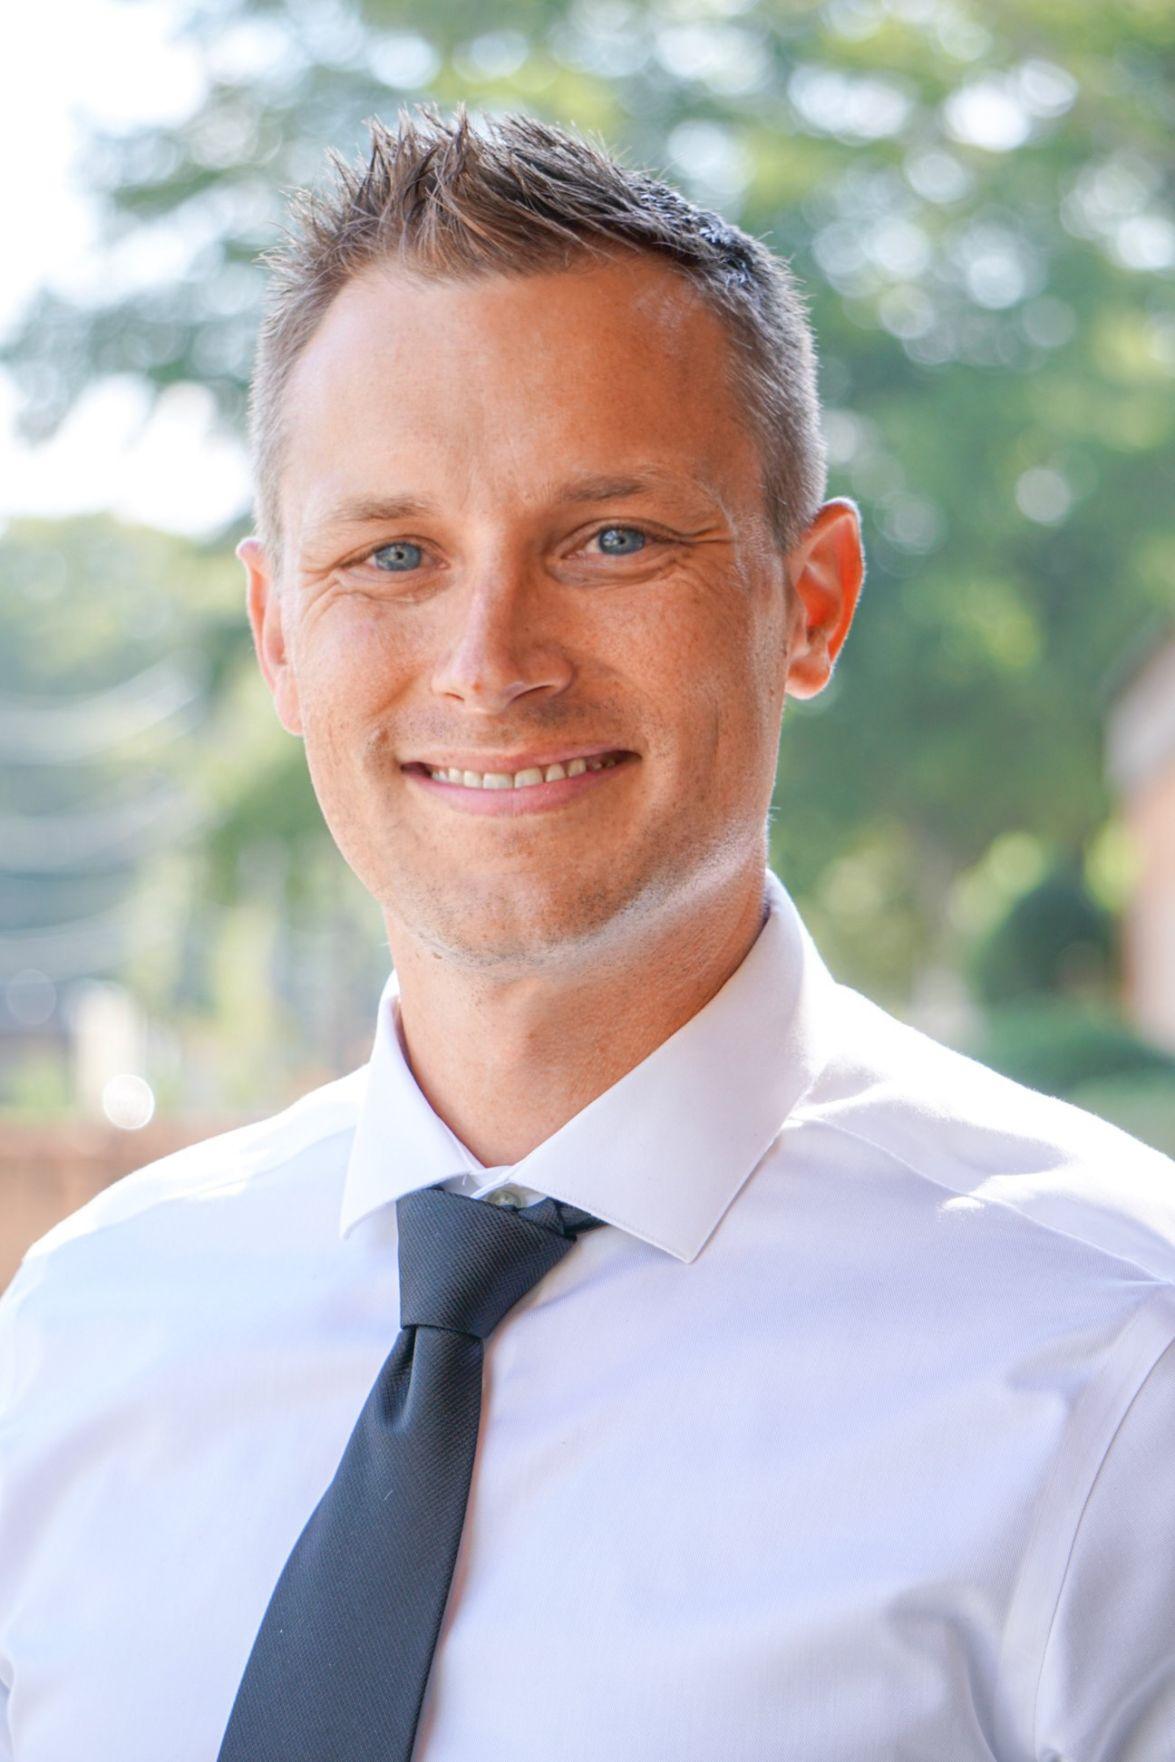 Joseph Pethel Coosa Middle School principal